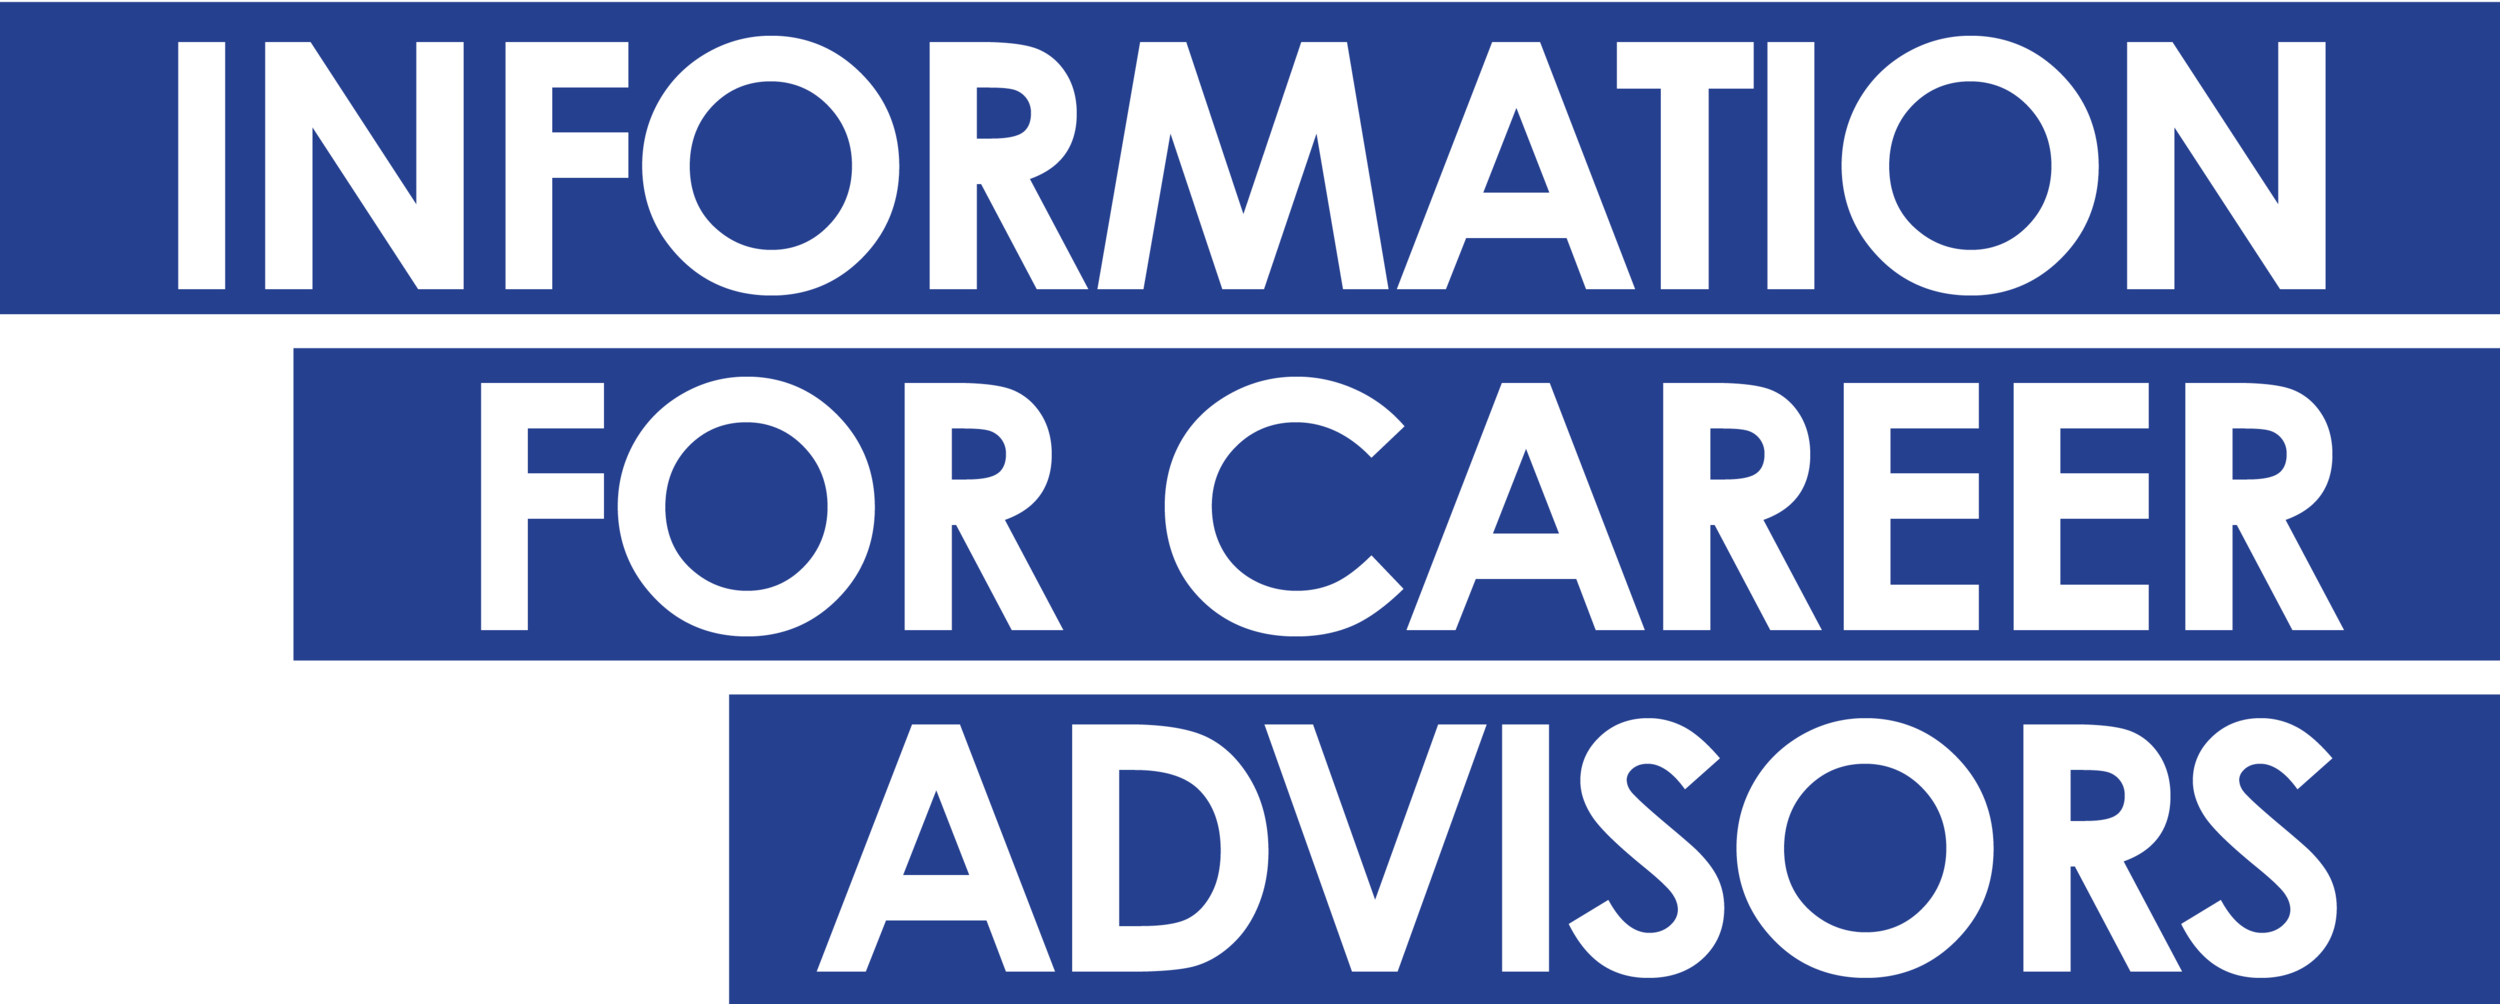 St Nicholas Pathways_information for career advisors